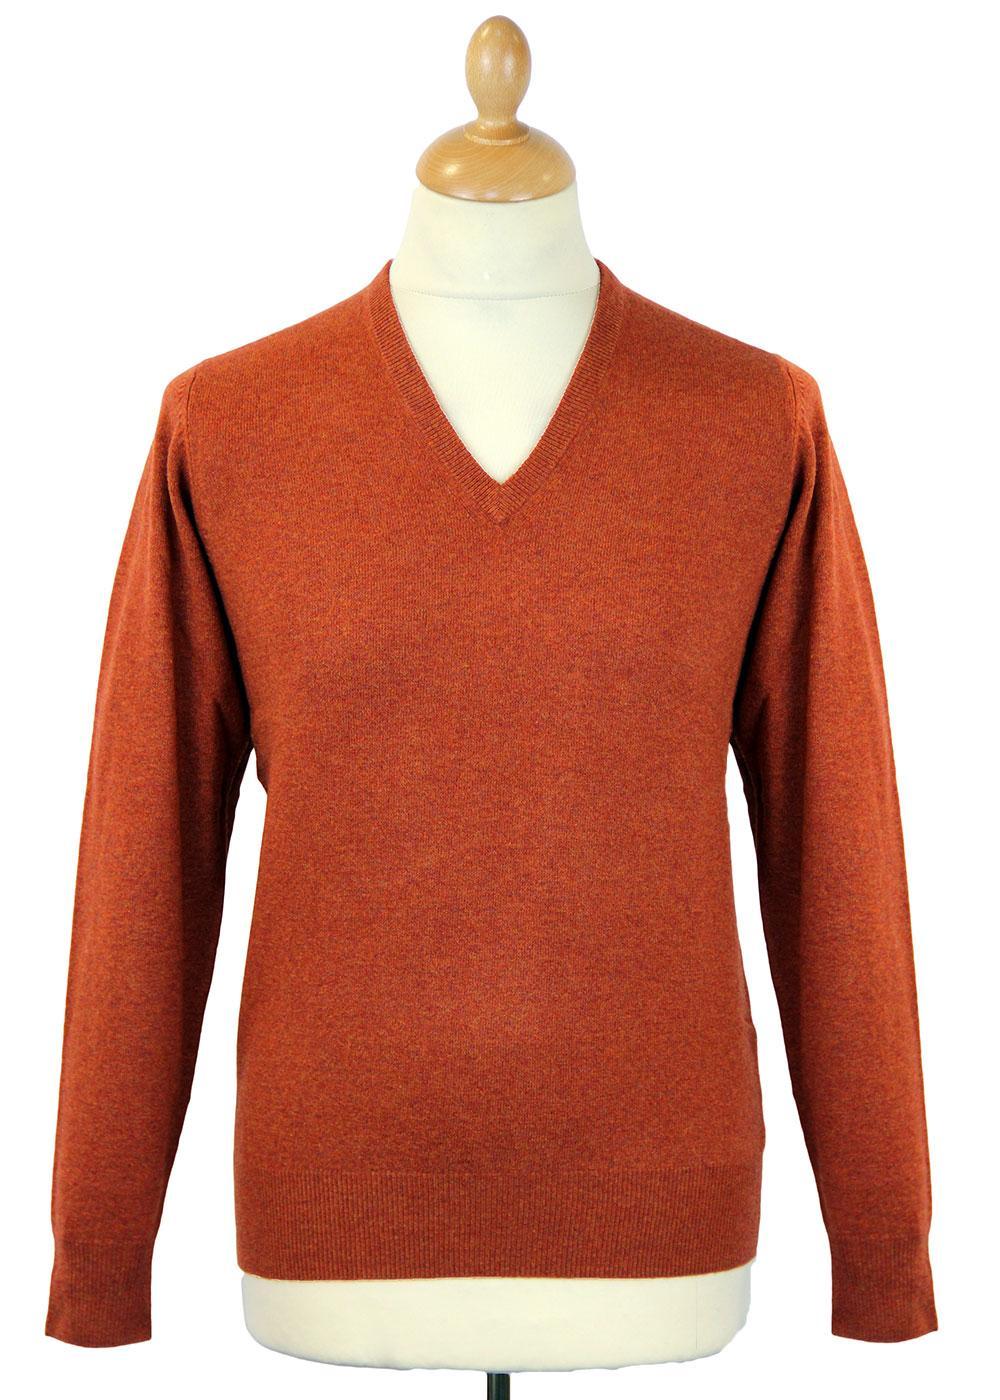 Albury ALAN PAINE Retro Mod Wool V-Neck Jumper (T)